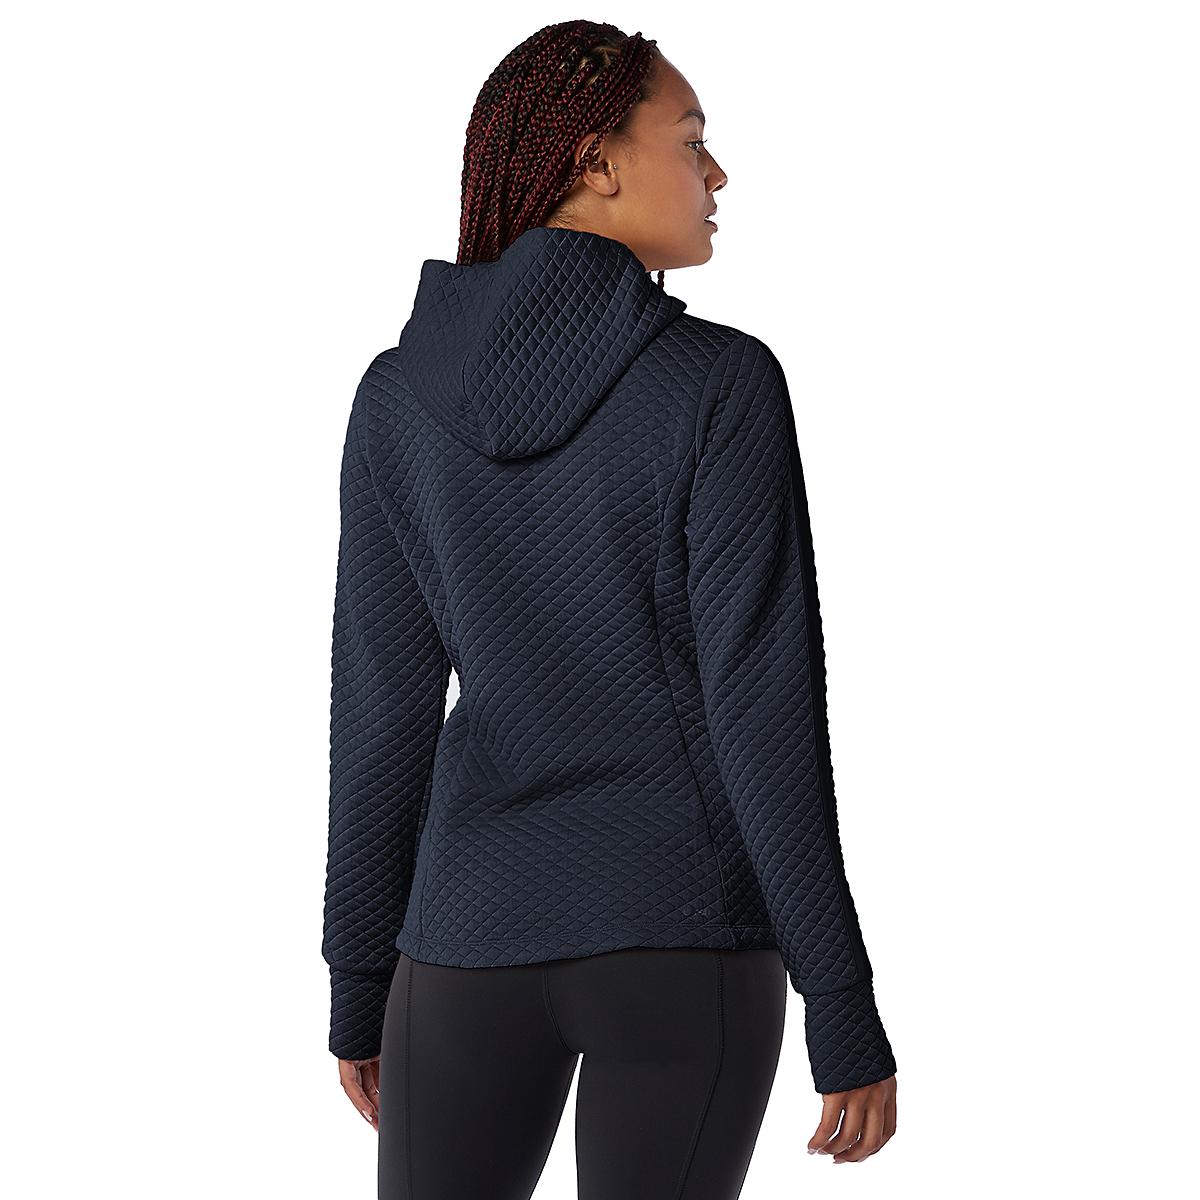 Women's New Balance Heatloft Jacket - Color: Eclipse Heather - Size: XS, Eclipse Heather, large, image 2